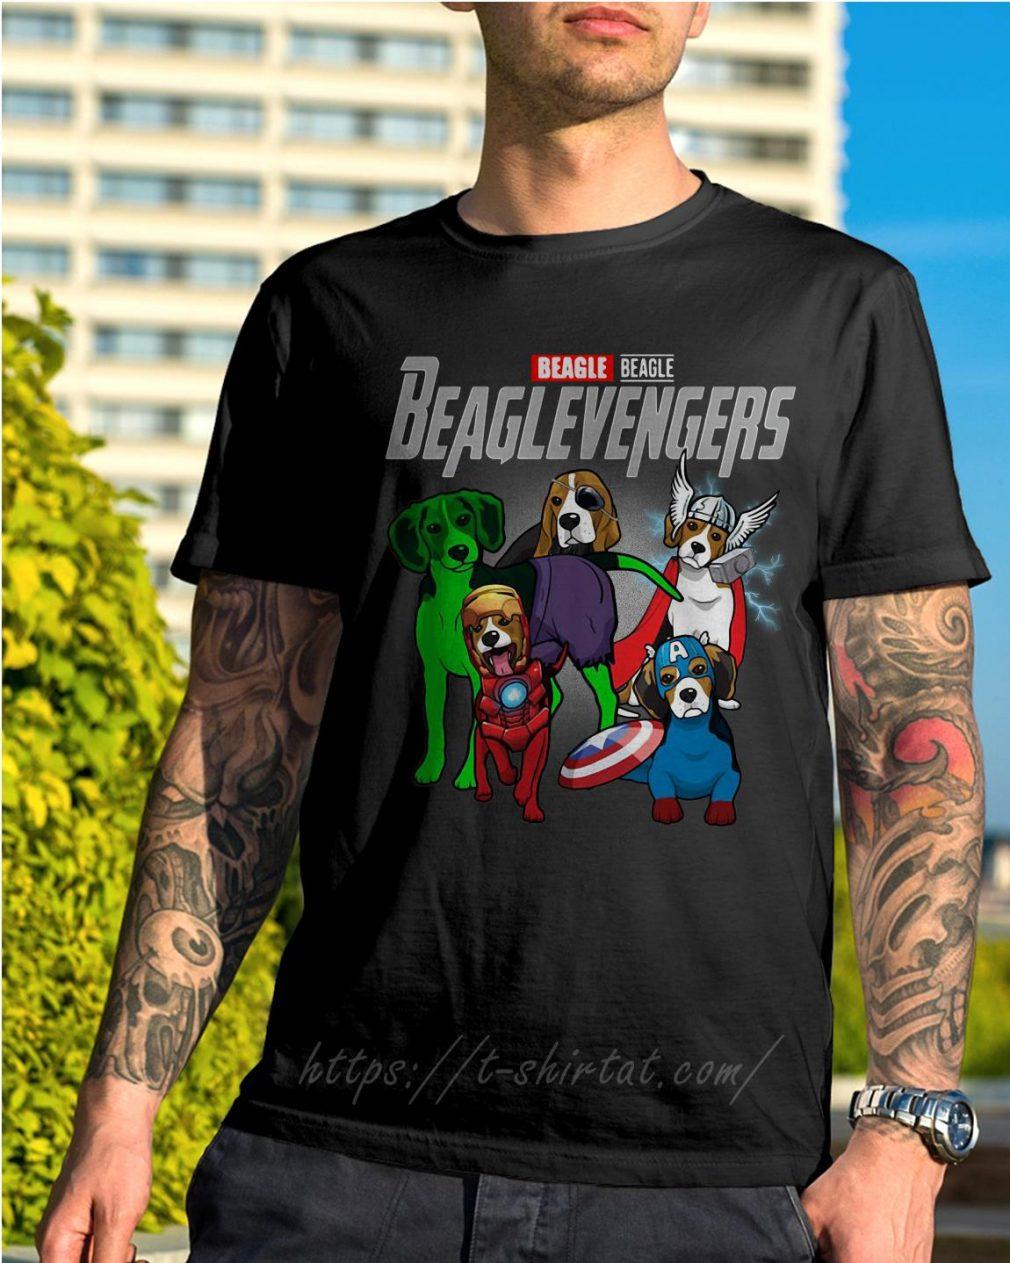 Marvel Beagle Beaglevengers shirt